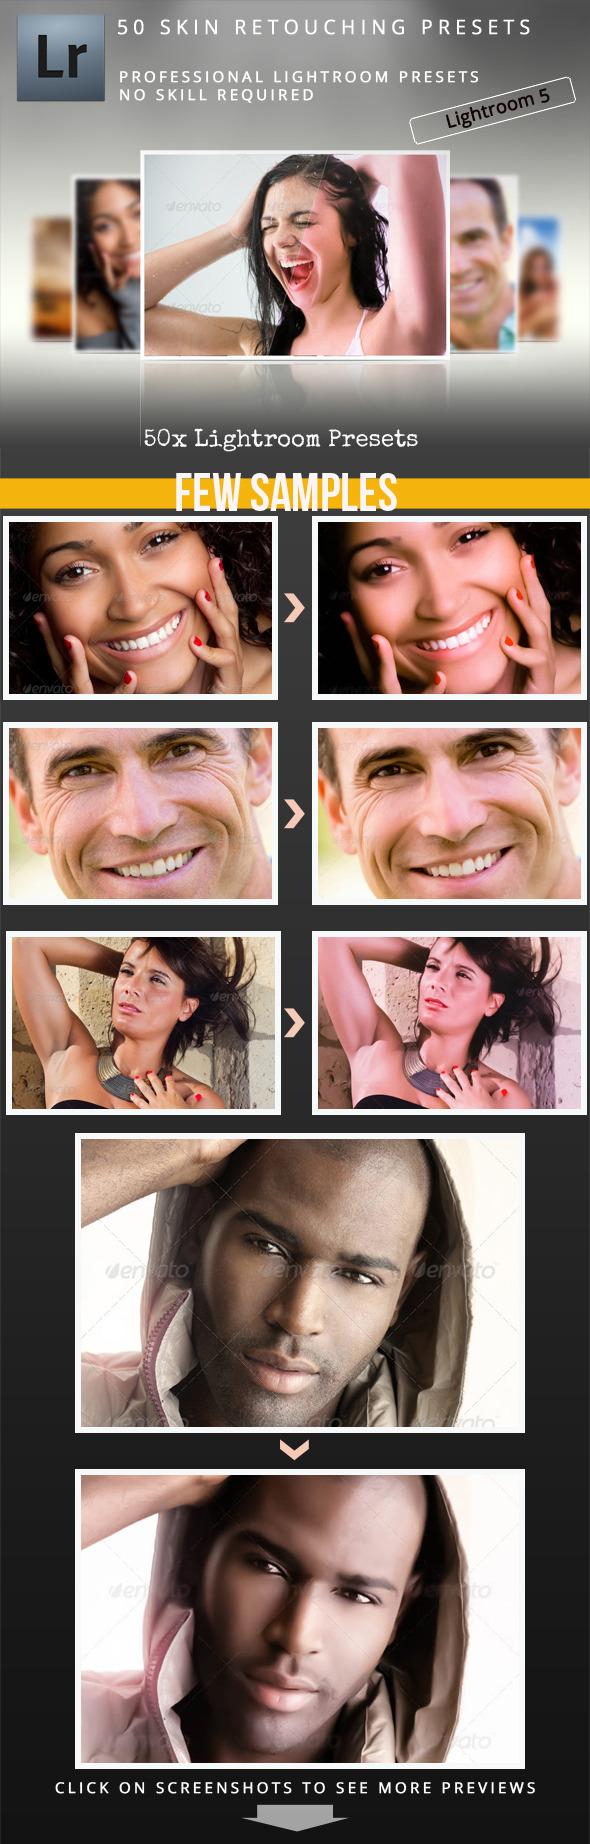 50 Skin Retouching Presets - Portrait Lightroom Presets